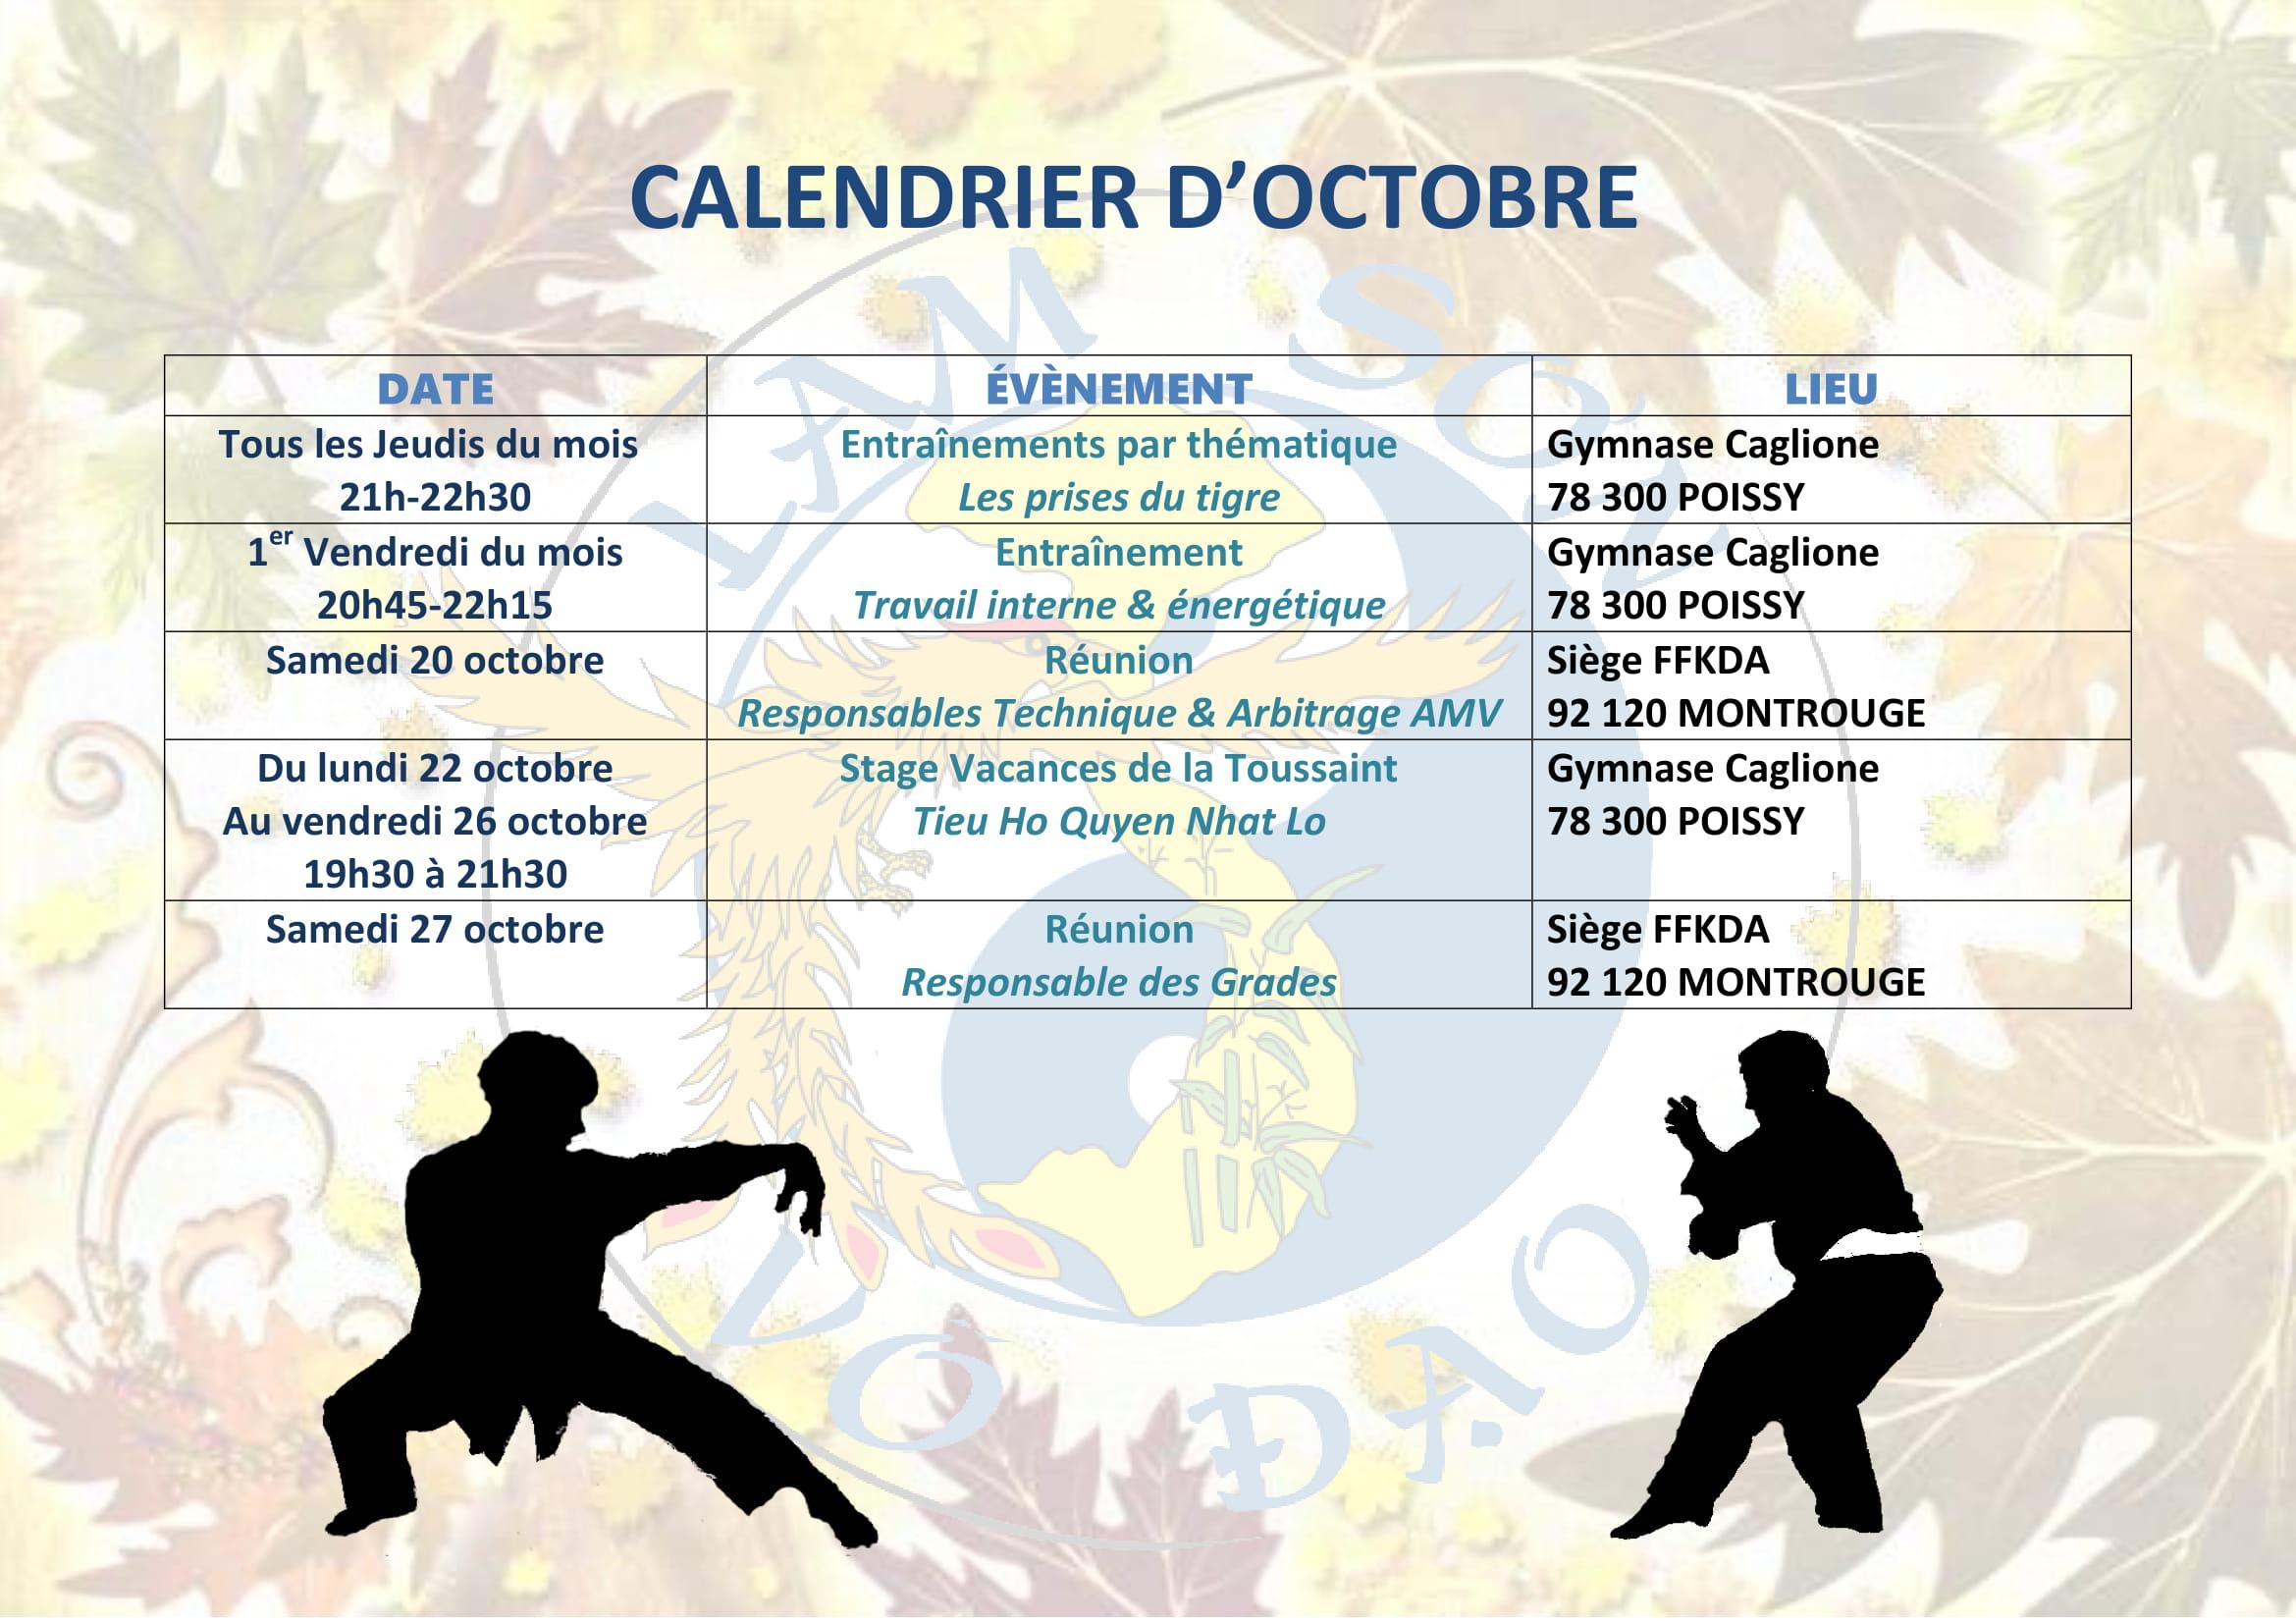 Calendrier Ffkda 2019 2020.Calendrier D Octobre Lam Son Vo Dao Poissy